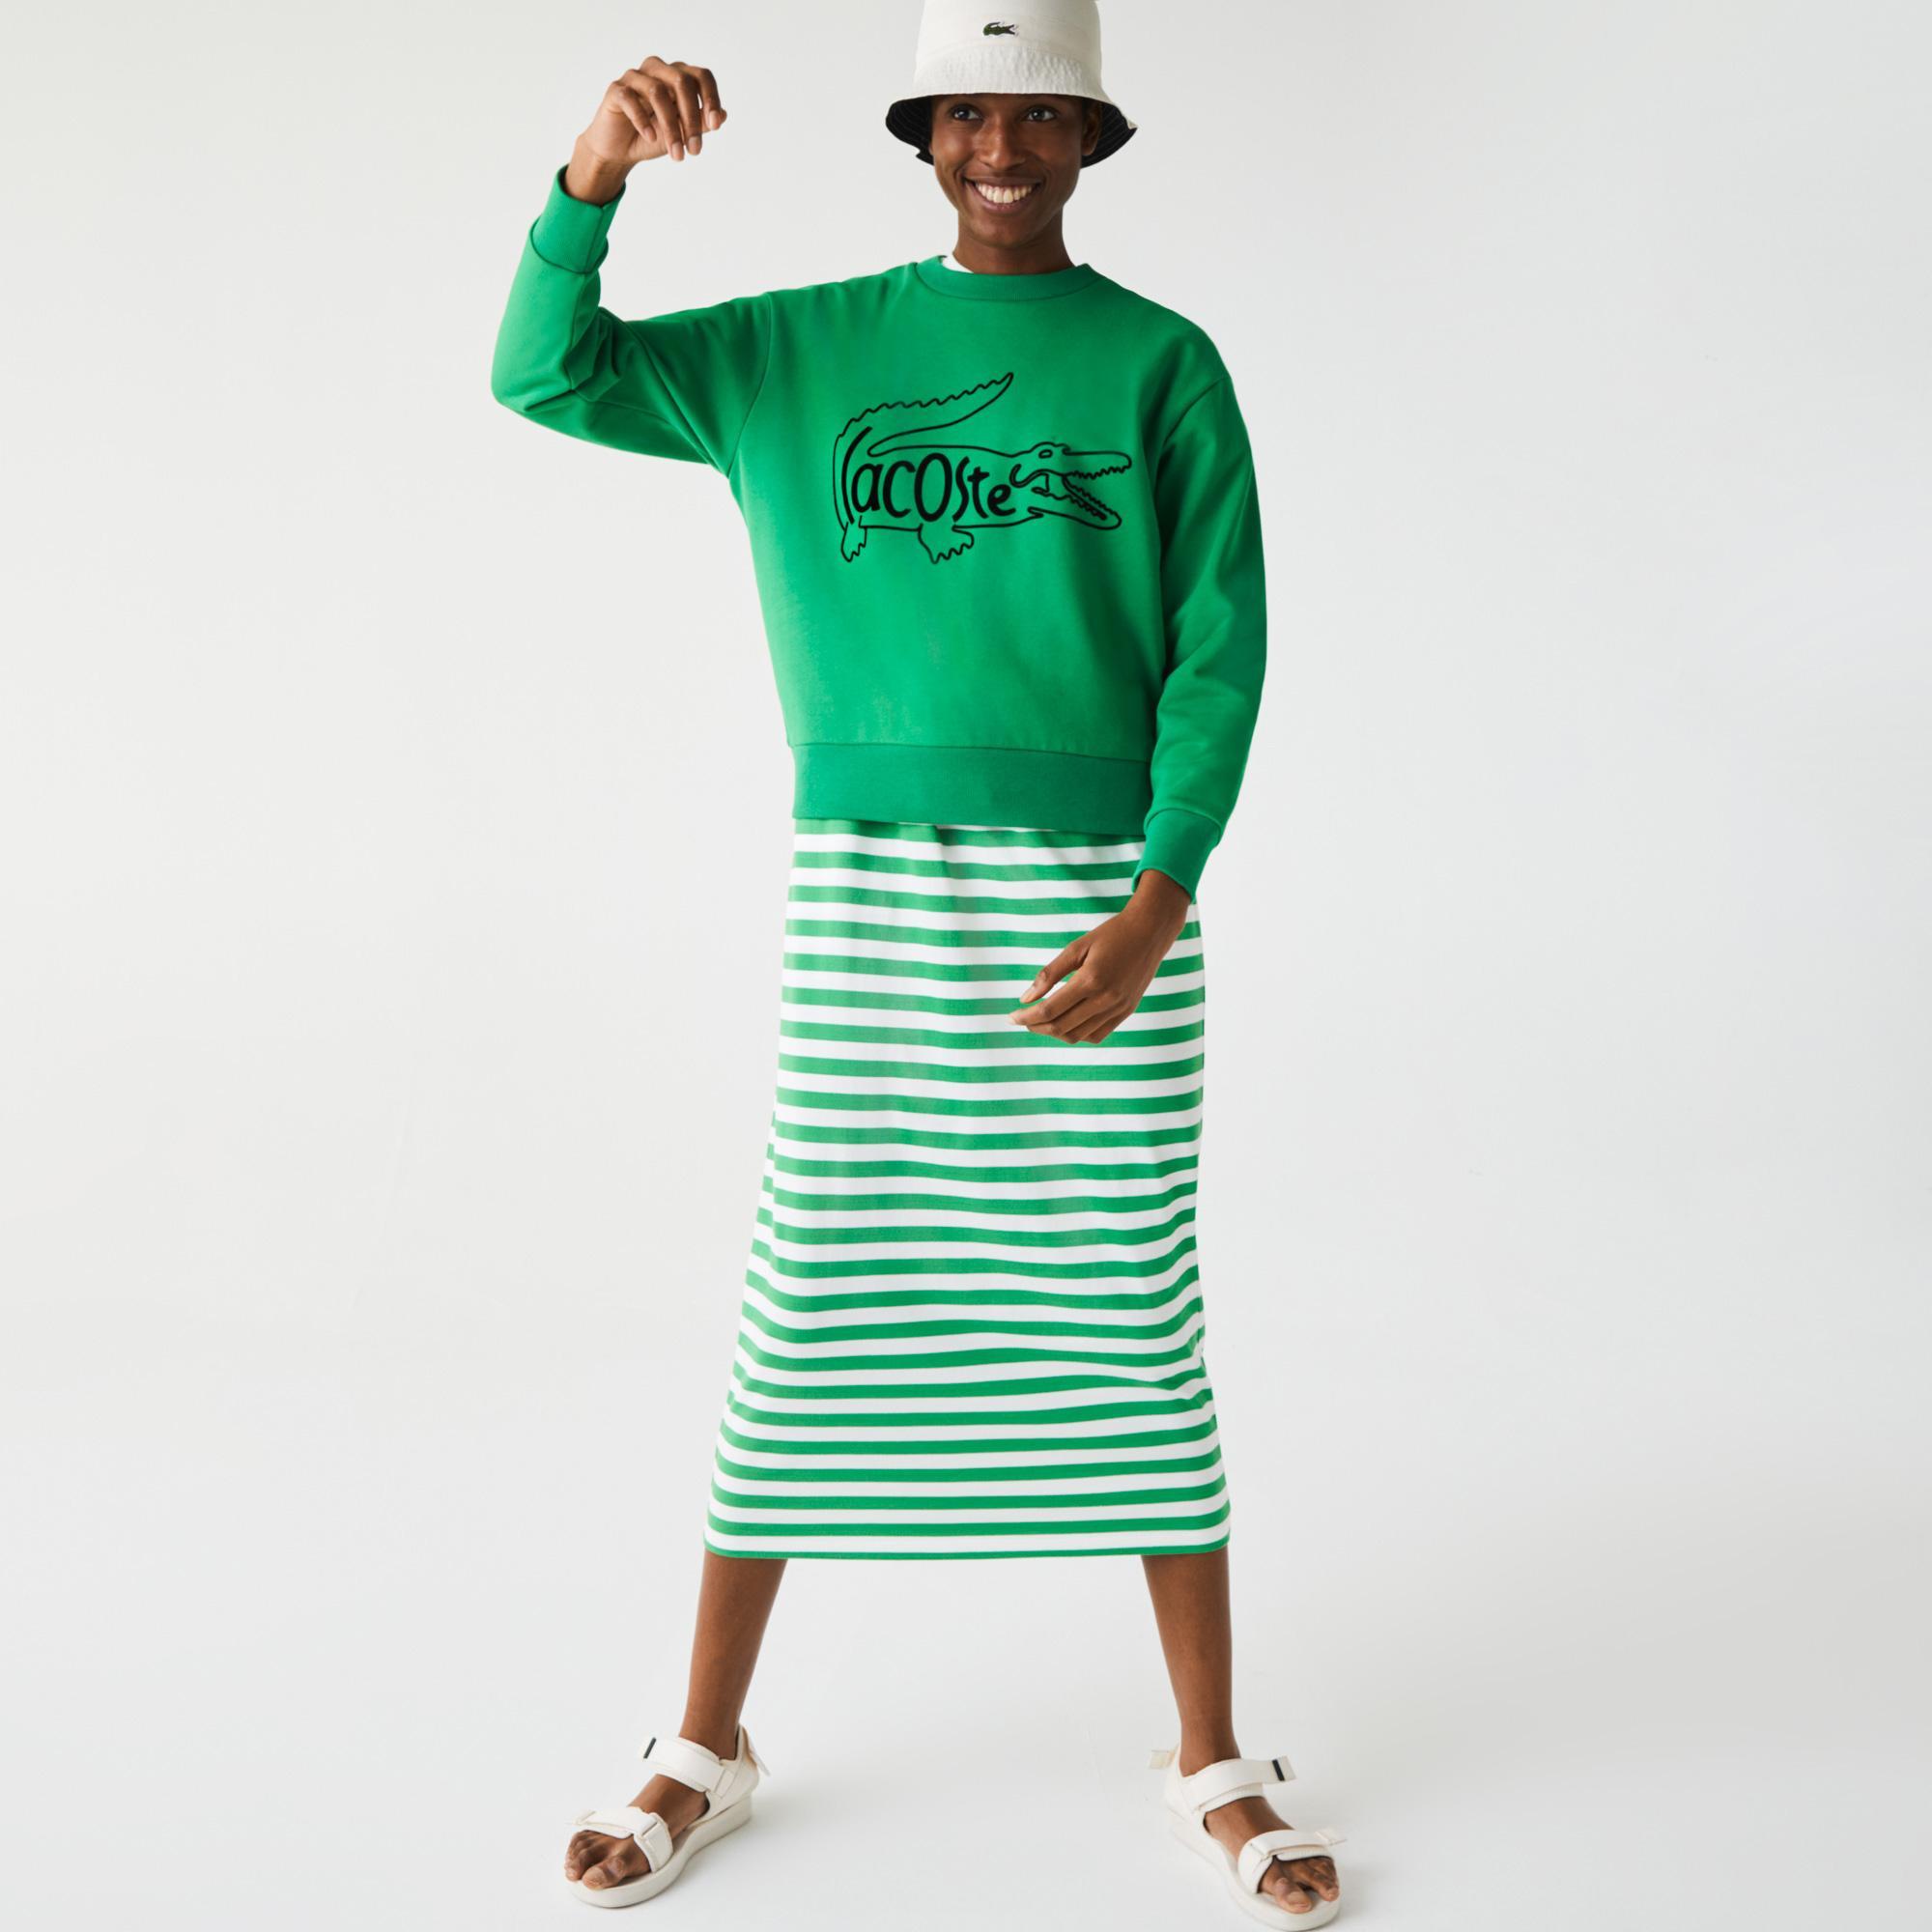 Lacoste Women's Crew Neck Crocodile Print Cotton Fleece Sweatshirt